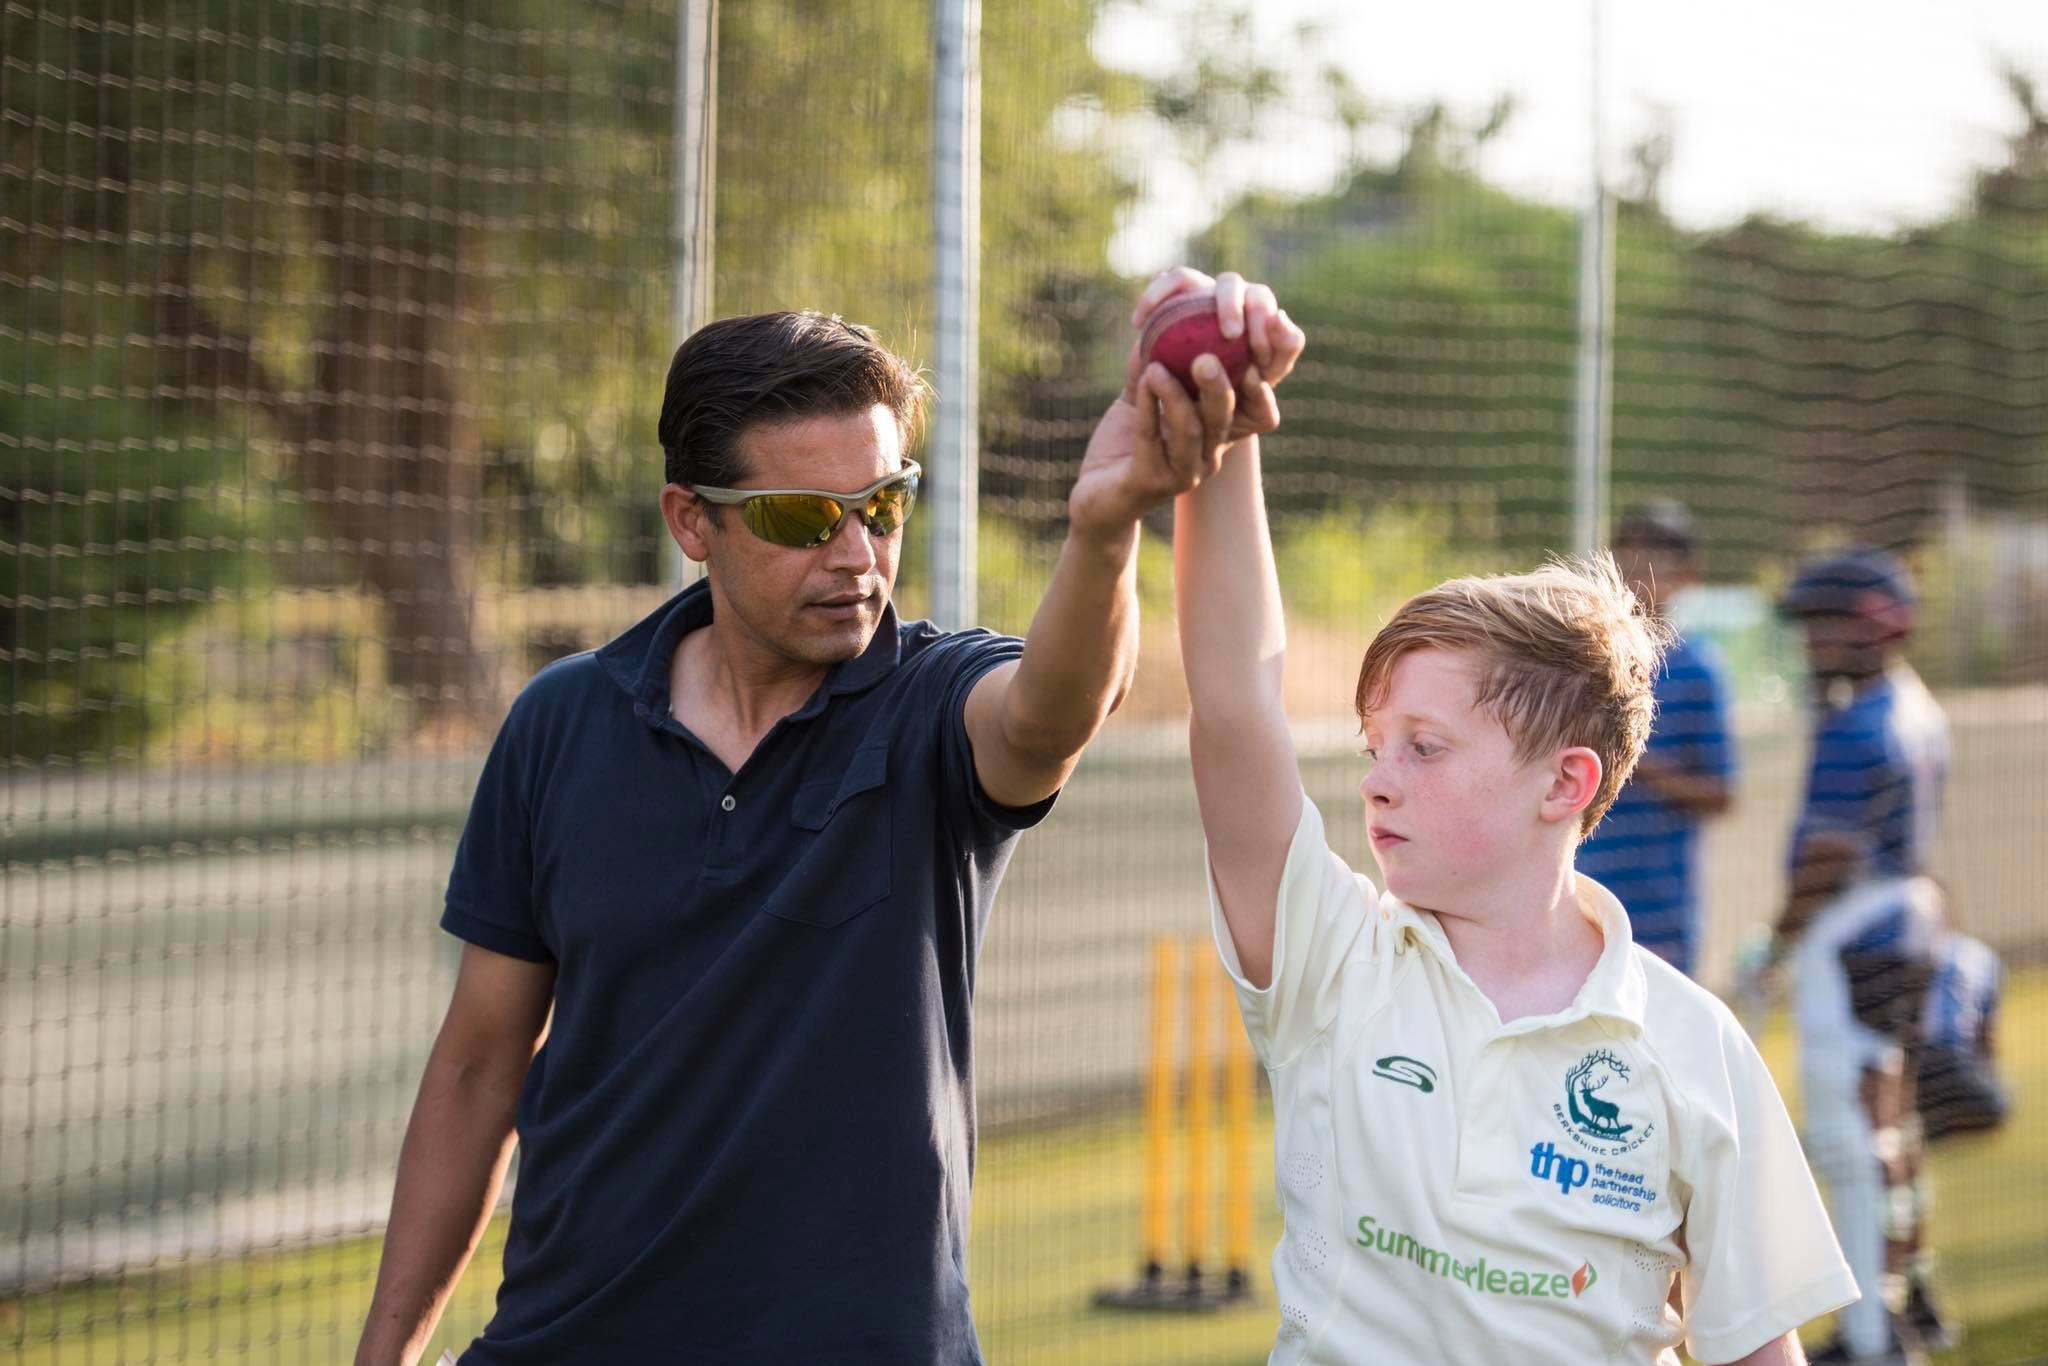 Kids Cricket skill development